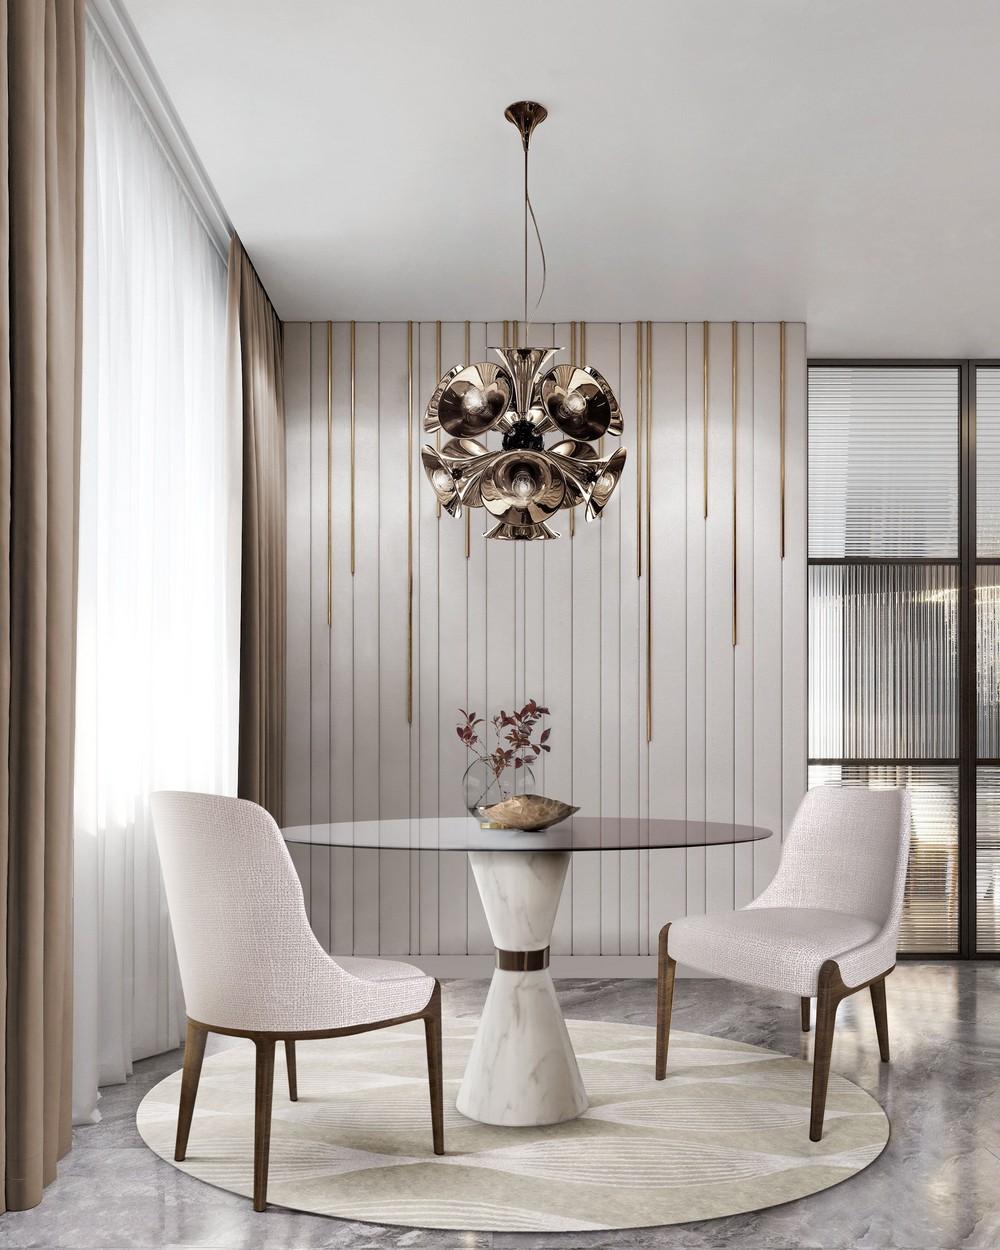 Luxury Lighting: Dining Room Ideas From Mid-century To Contemporary dining room Luxury Lighting: Dining Room Ideas From Mid-century To Contemporary Ij3 cbag